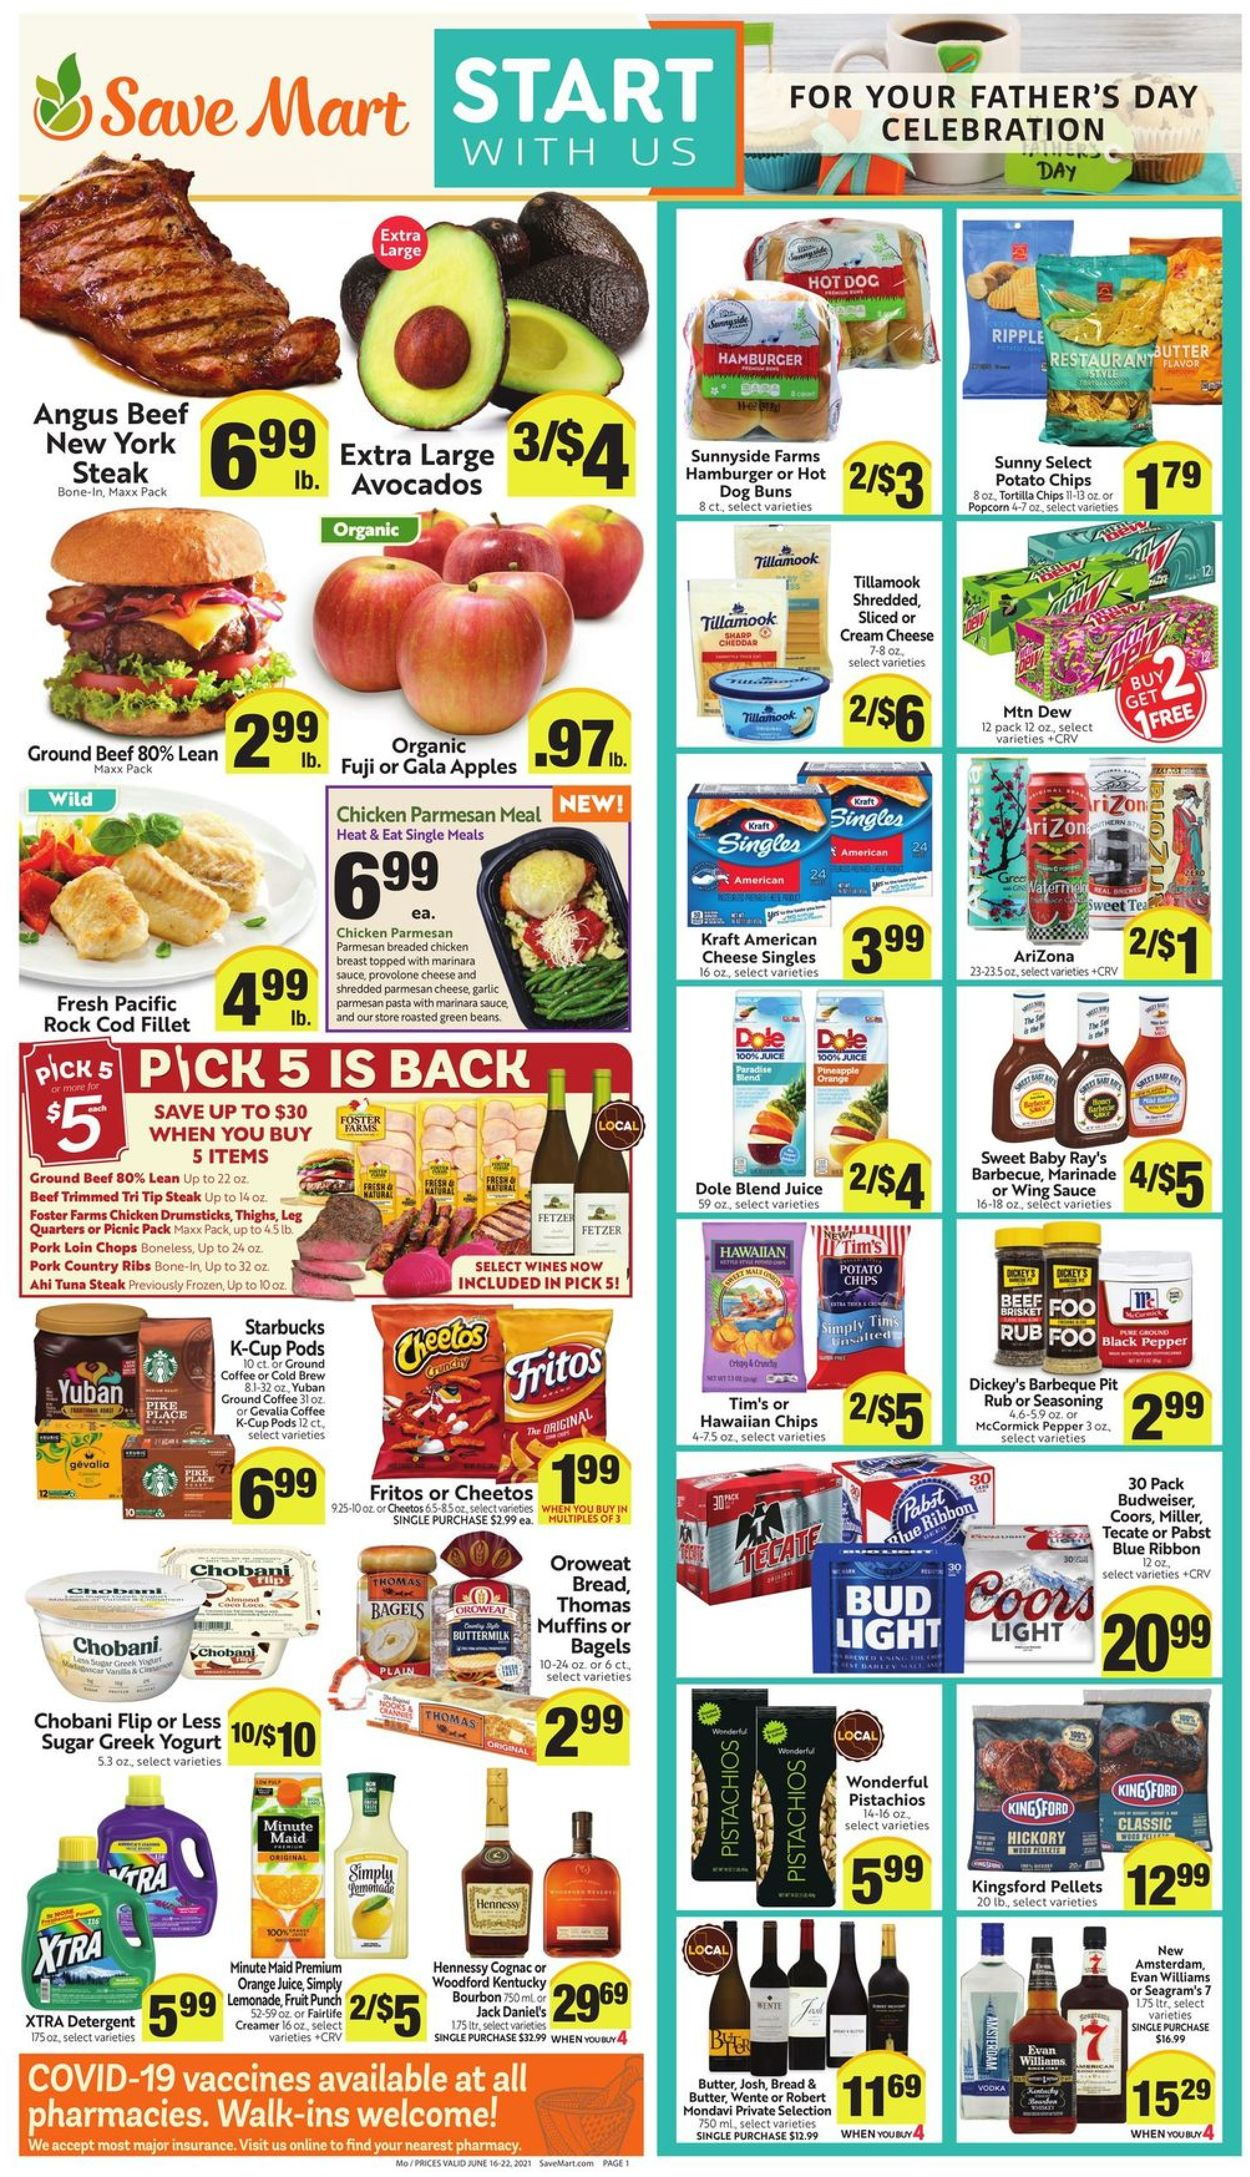 Save Mart Weekly Ad Circular - valid 06/16-06/22/2021